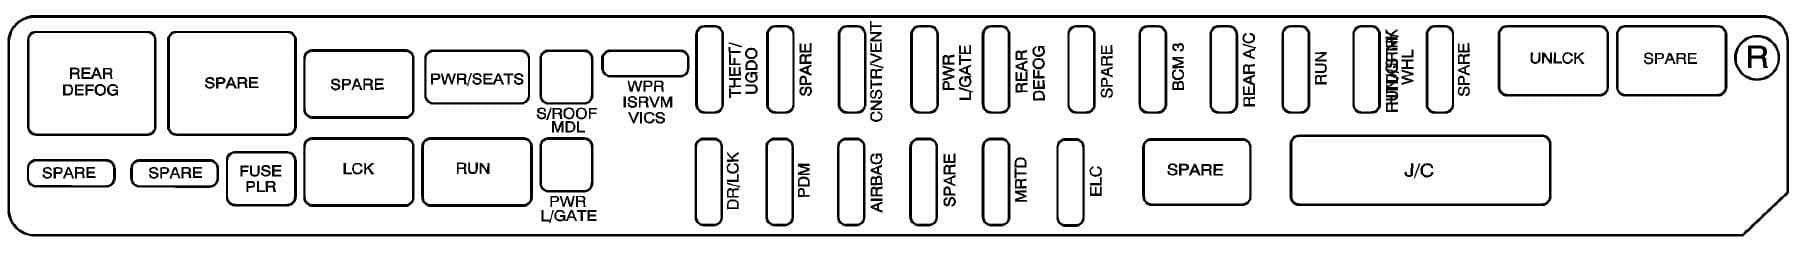 Cadillac SRX mk1 - fuse box - rear compartment (right side)